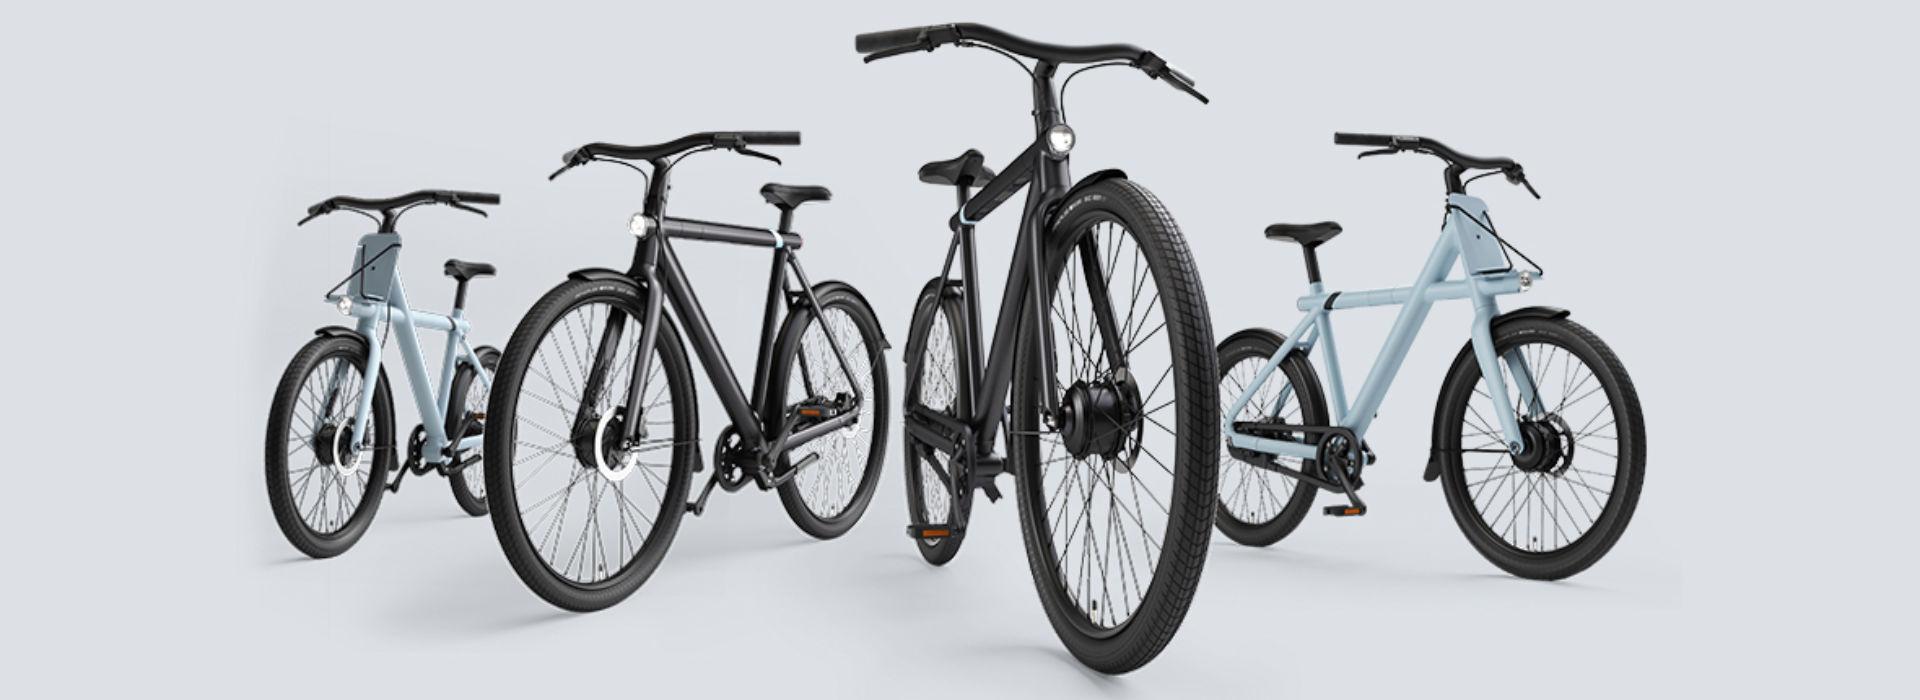 VanMoof S3 & X3の機能のご紹介: It's time to ride the future